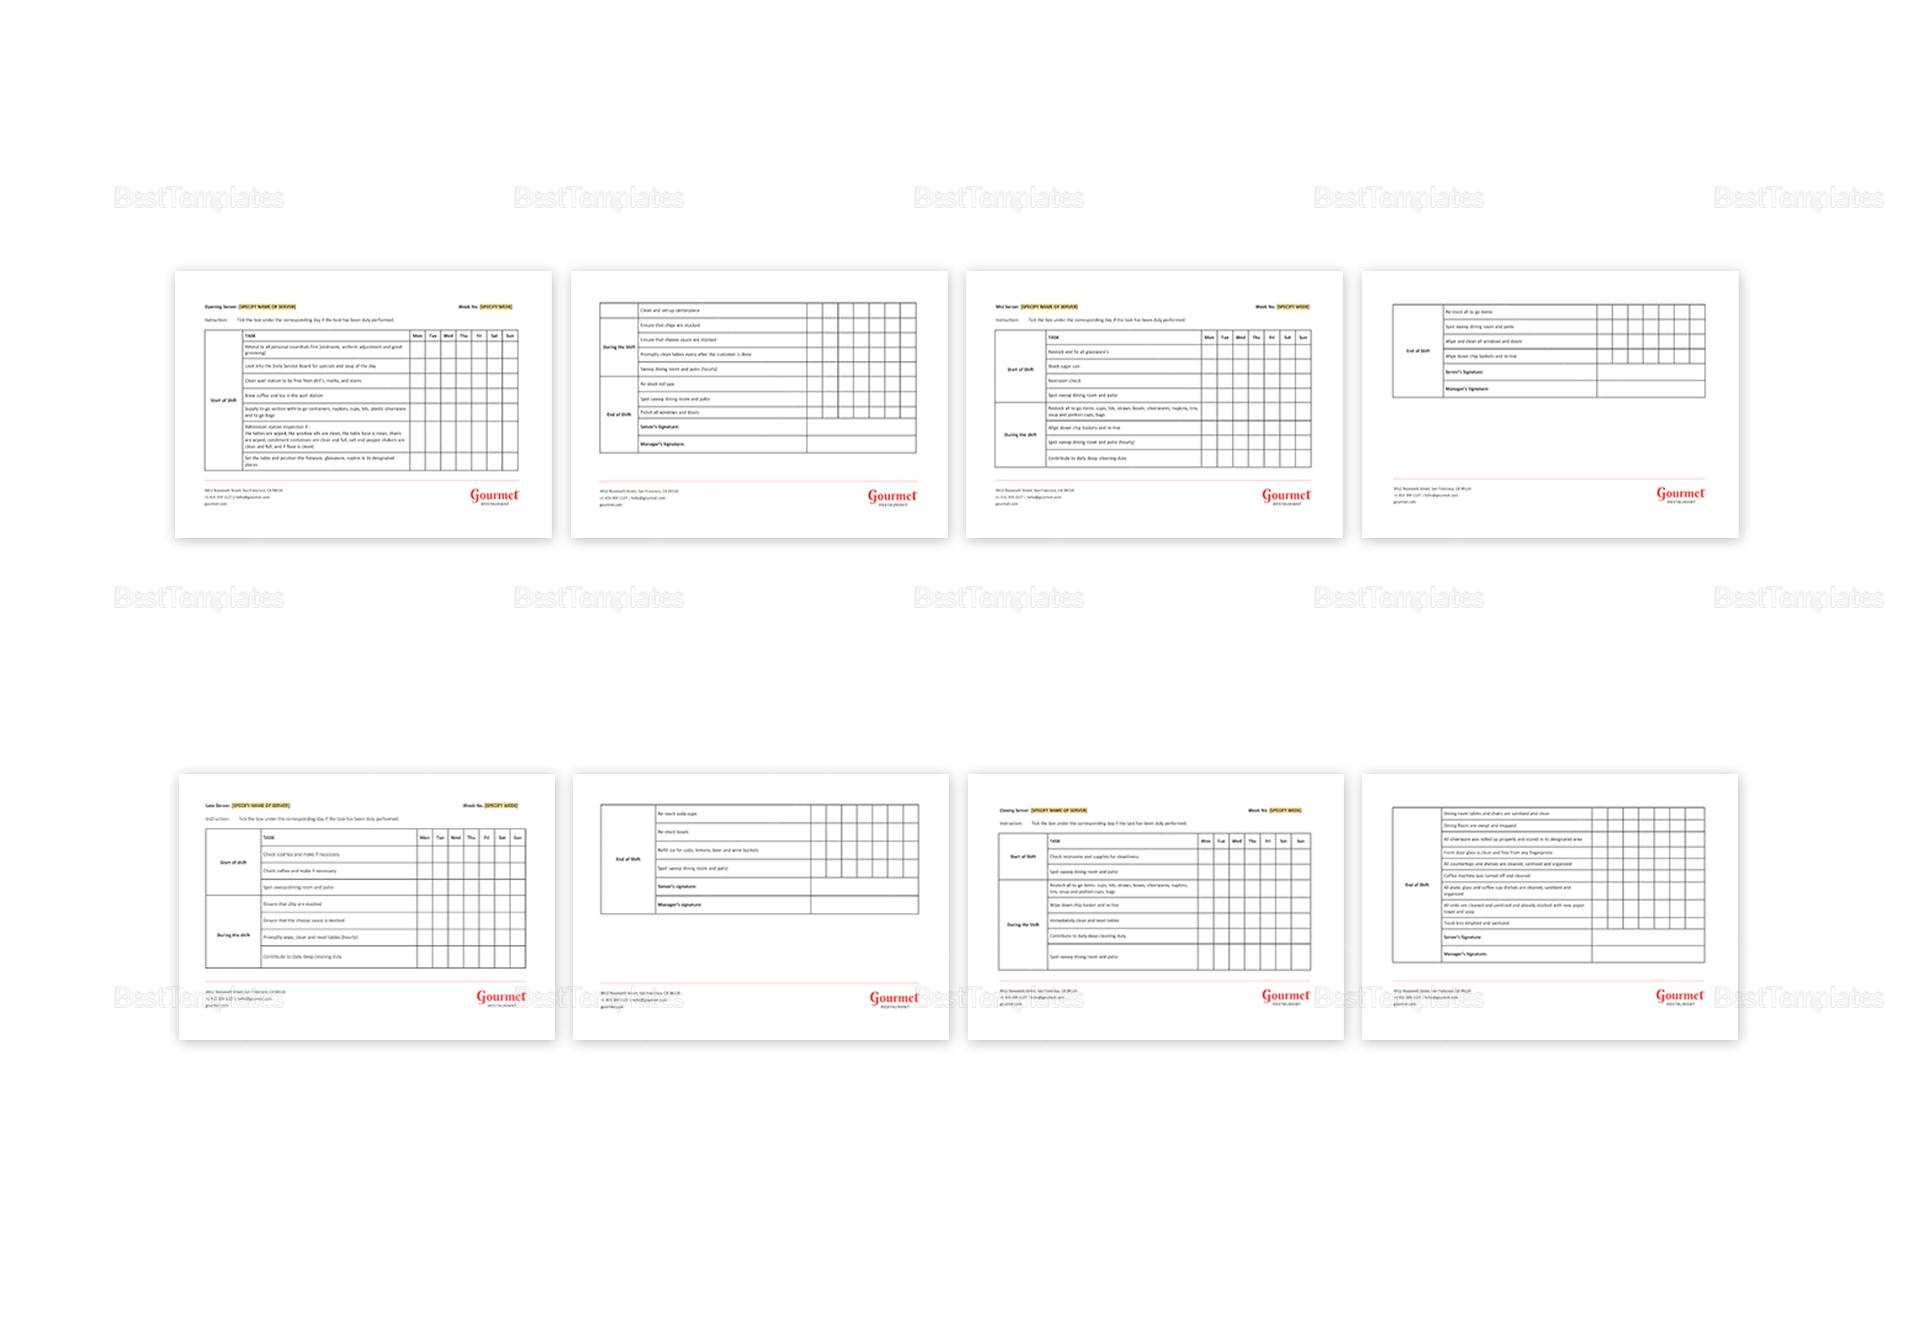 Restaurant Server Sidework Checklist Template in MS Word